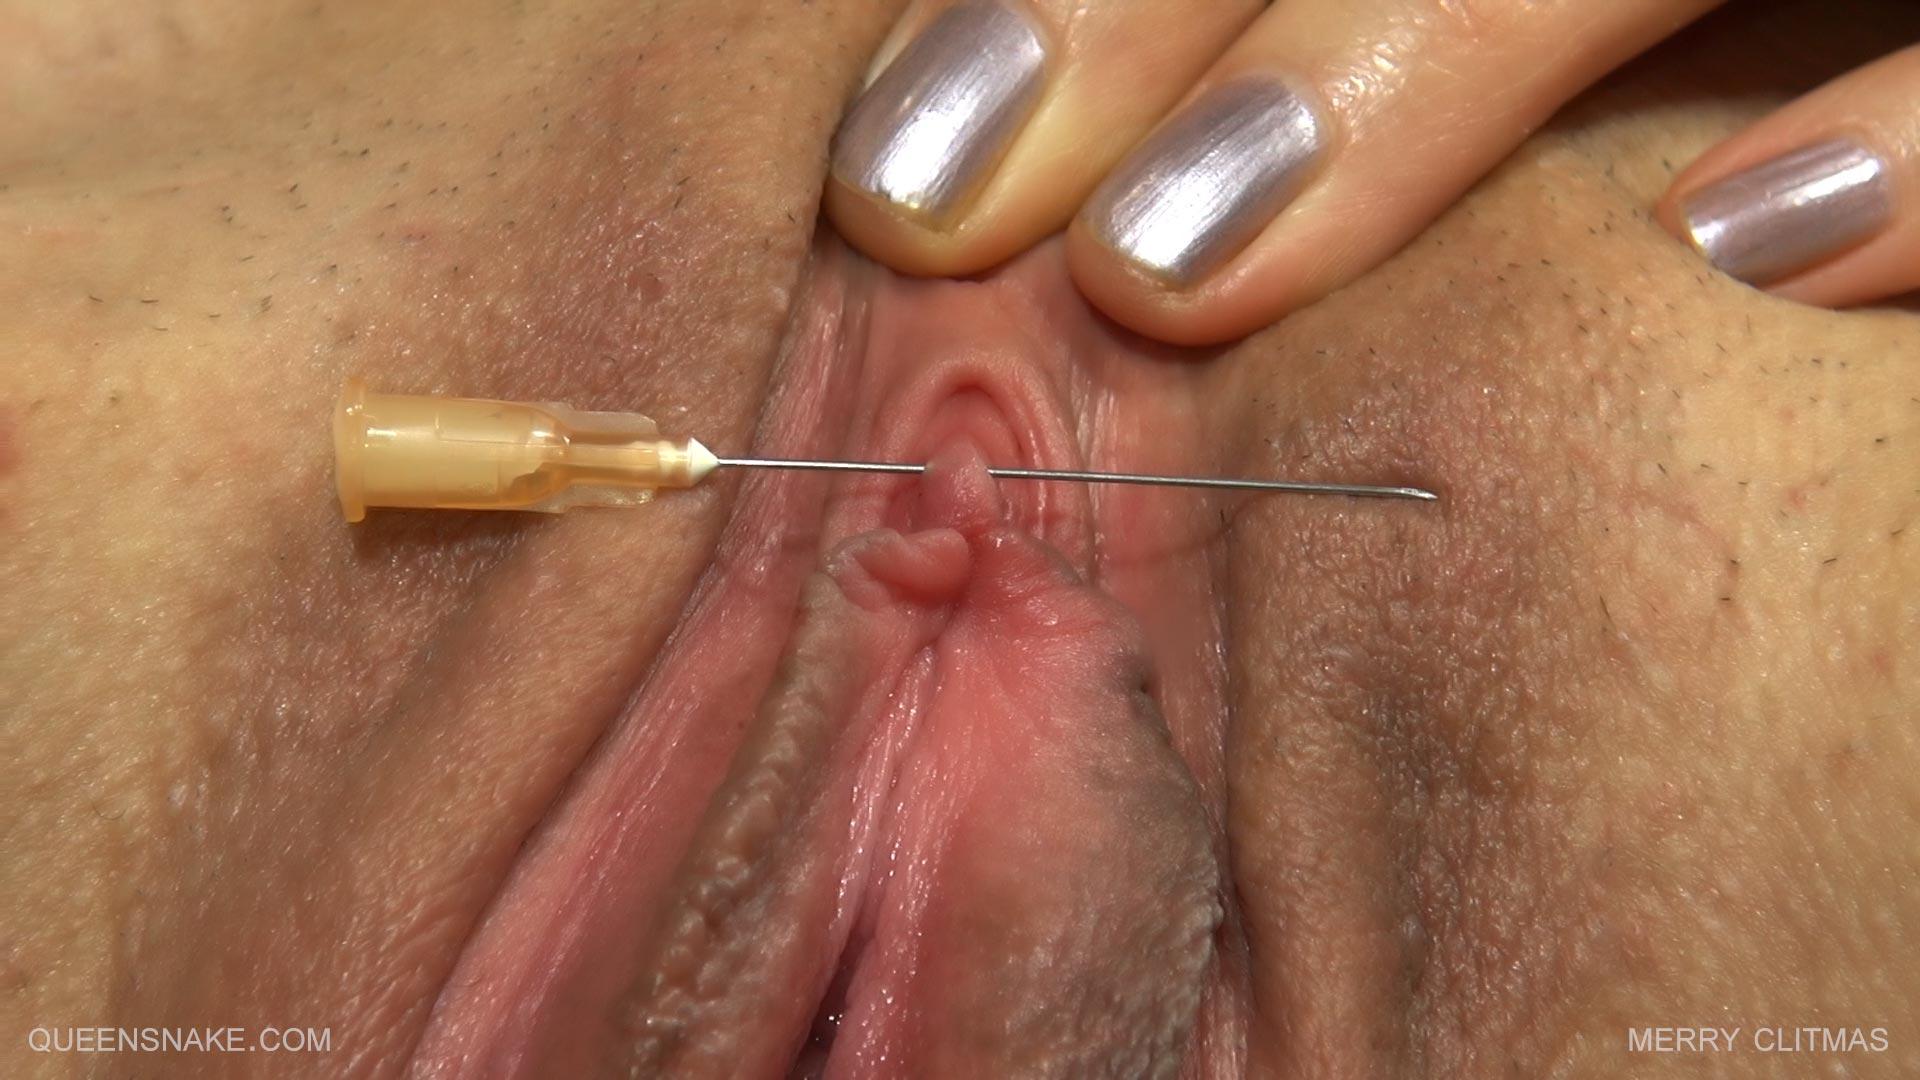 Deepthroat anal play big tongue abigail dupree